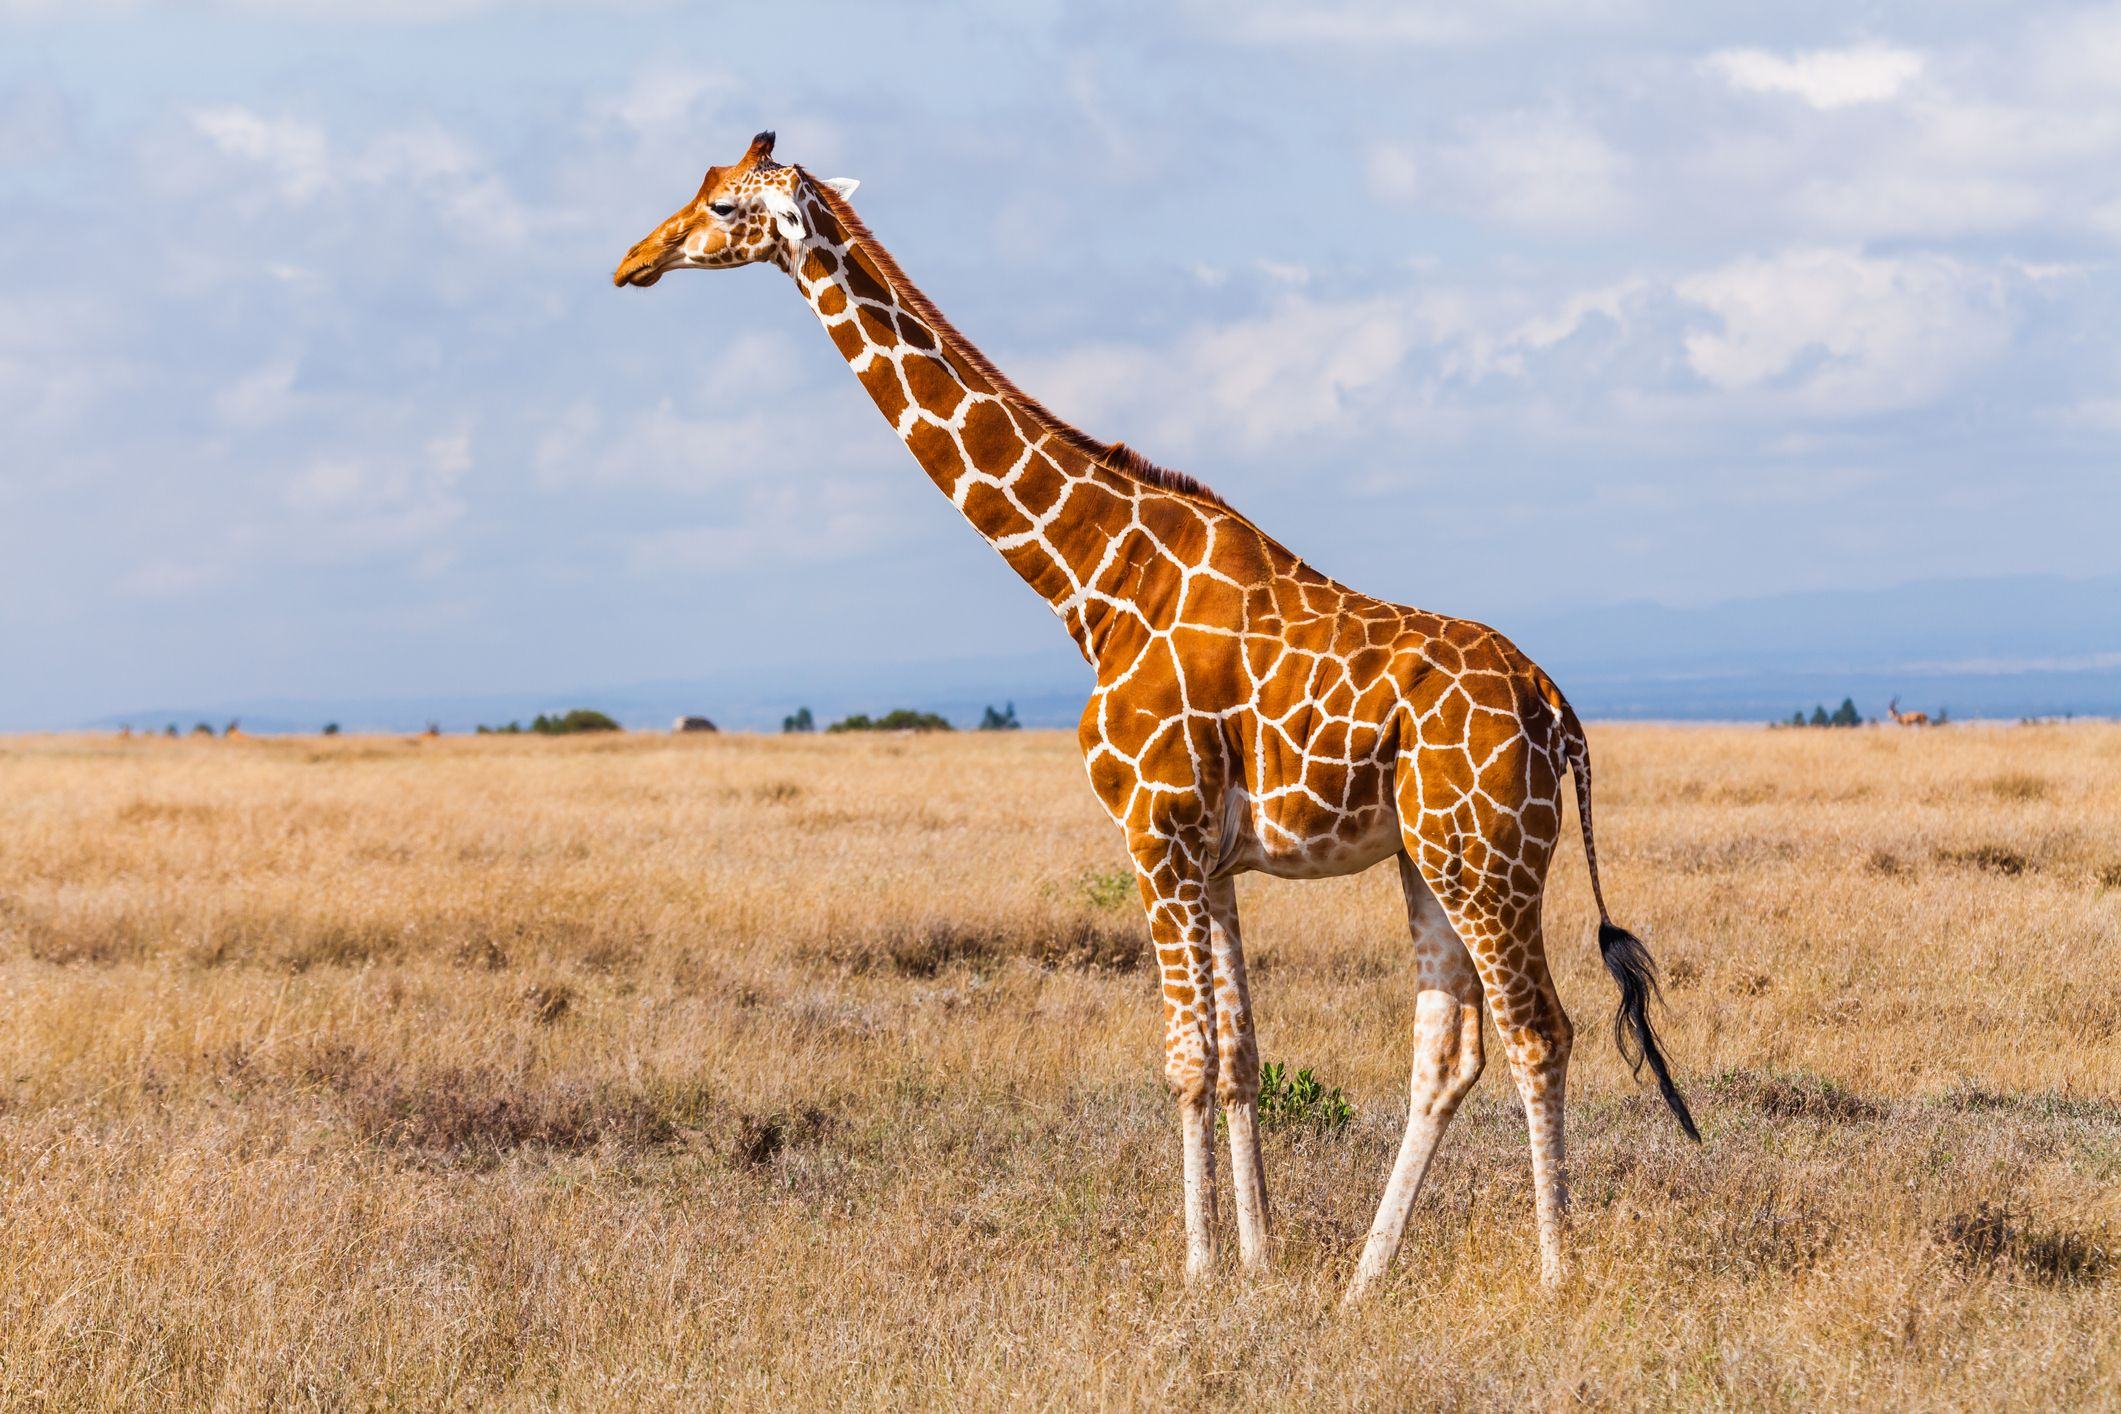 Giraffes in the savannah, Kenya